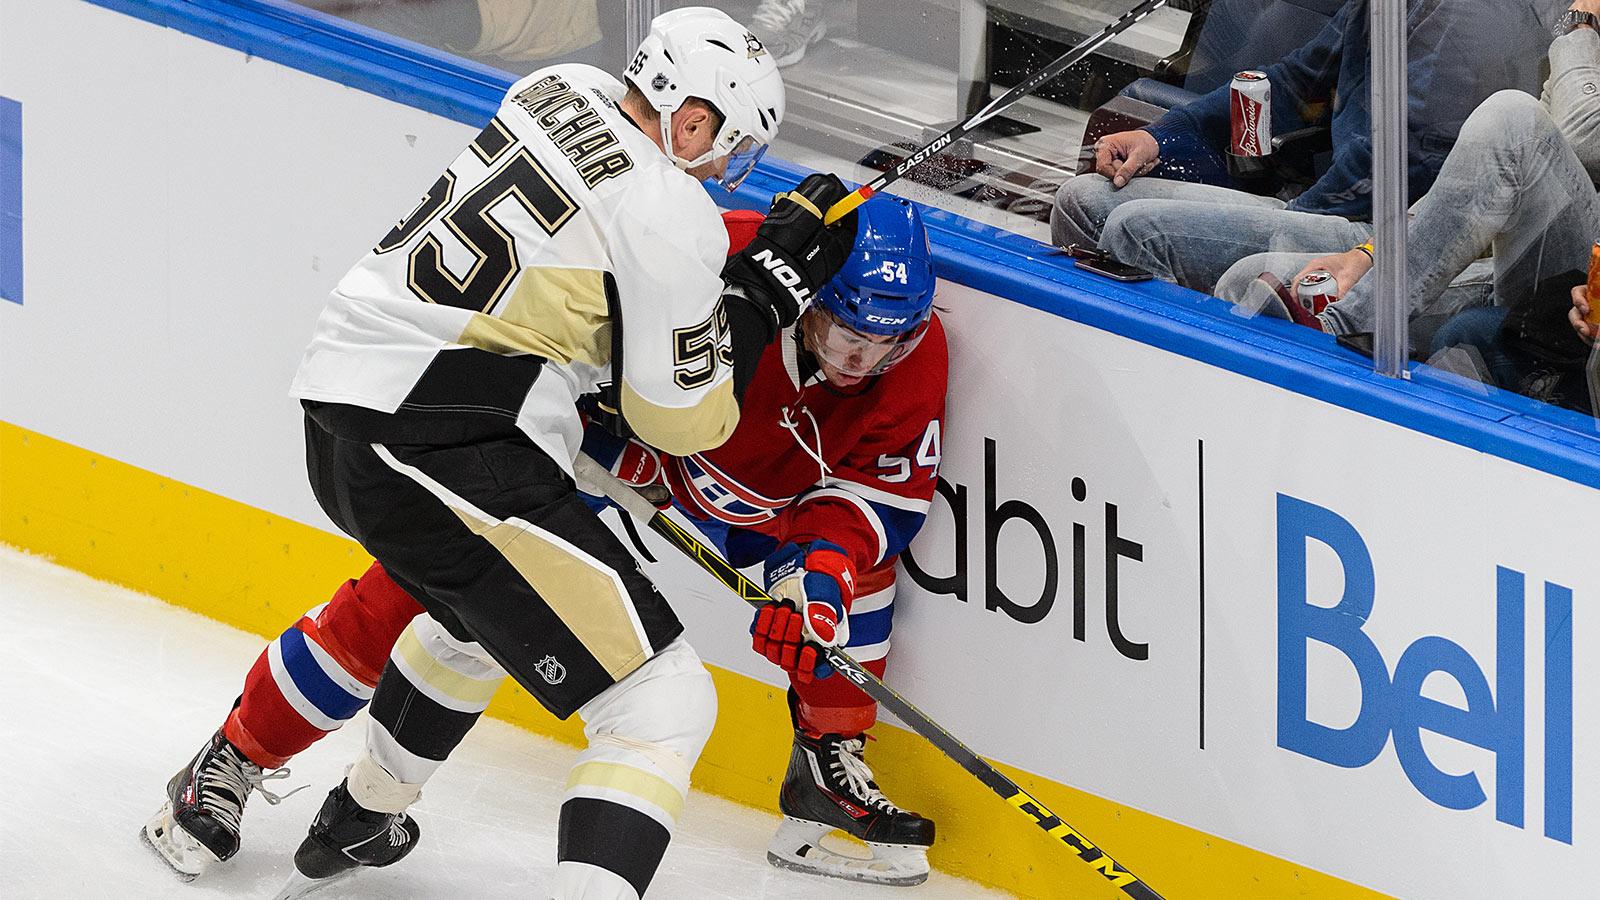 Penguins' Gonchar to serve as defensemen development coach